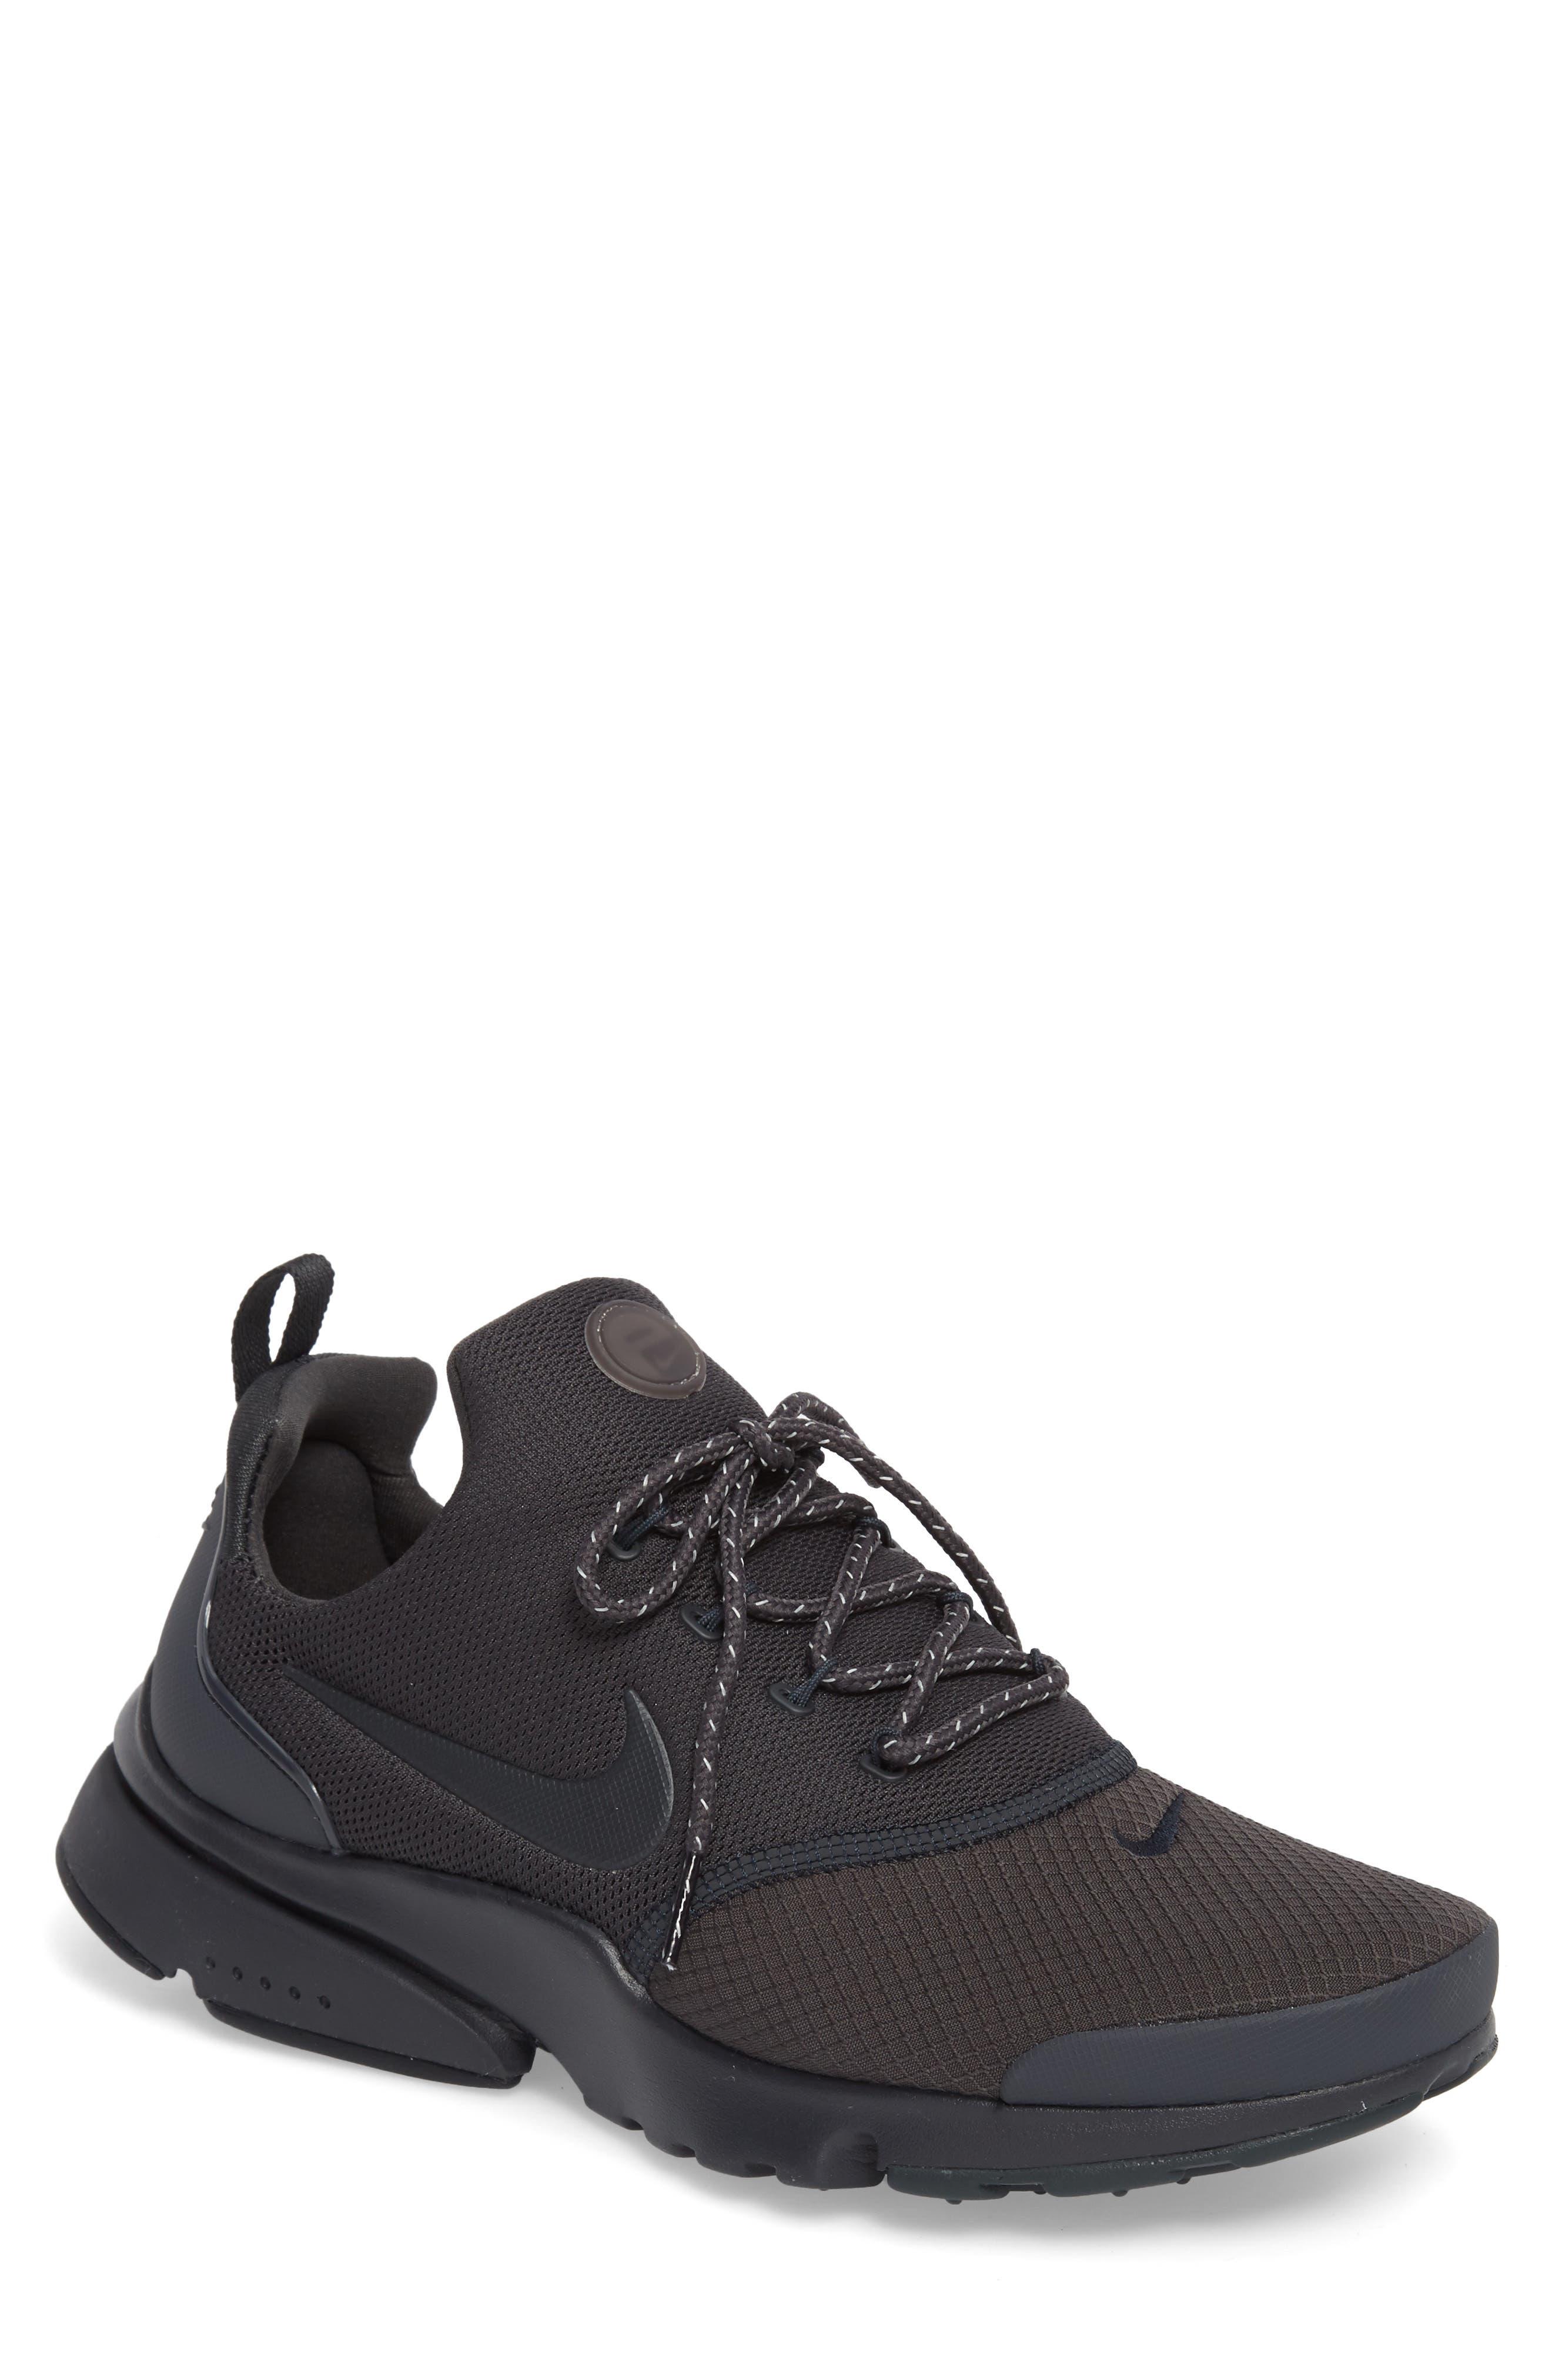 Presto Fly SE Sneaker,                             Main thumbnail 1, color,